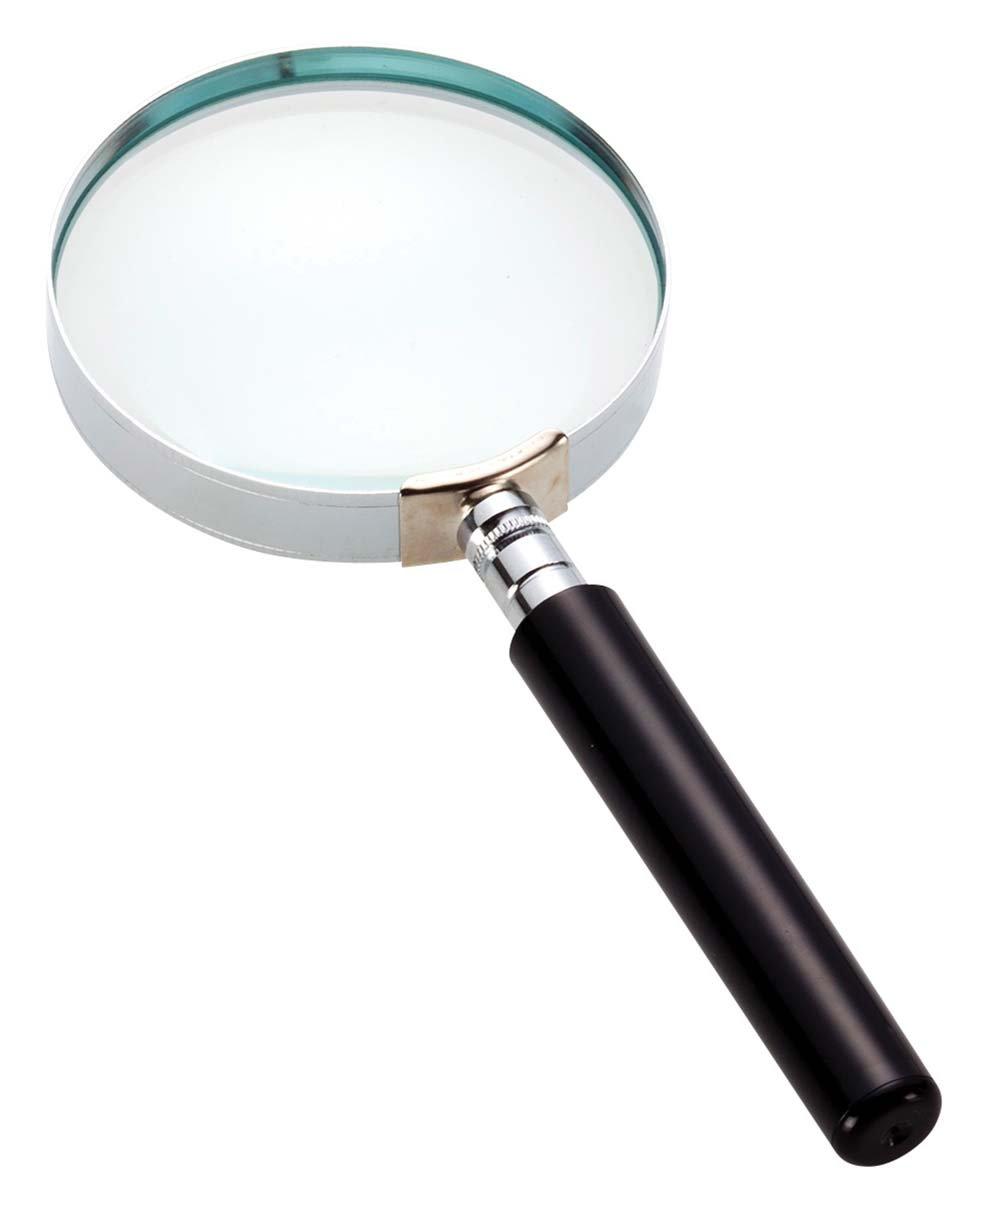 Opticron 2x100mm Classic G Hand Magnifier 52656